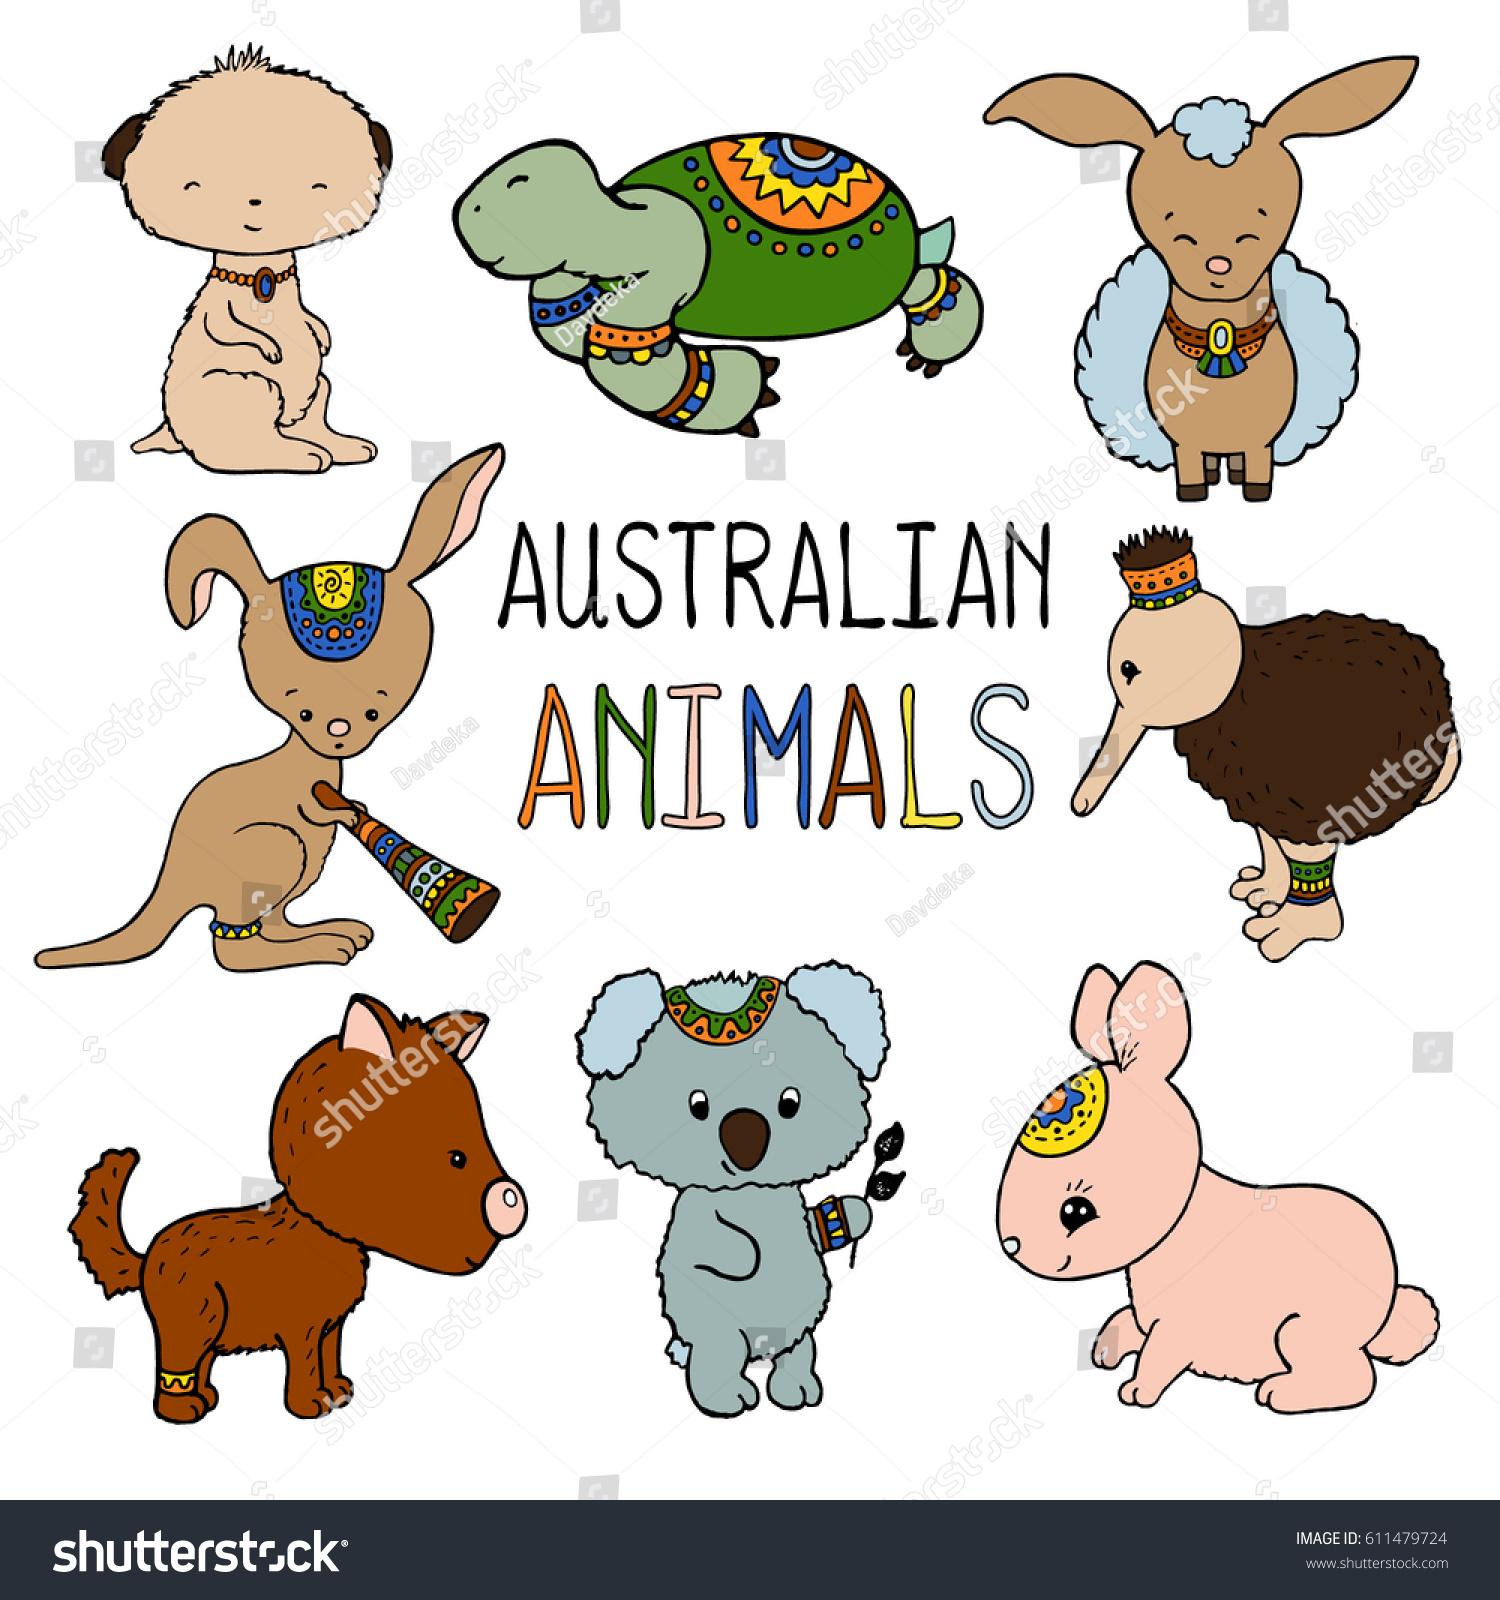 online image   photo editor shutterstock editor australian clip art free australia clipart